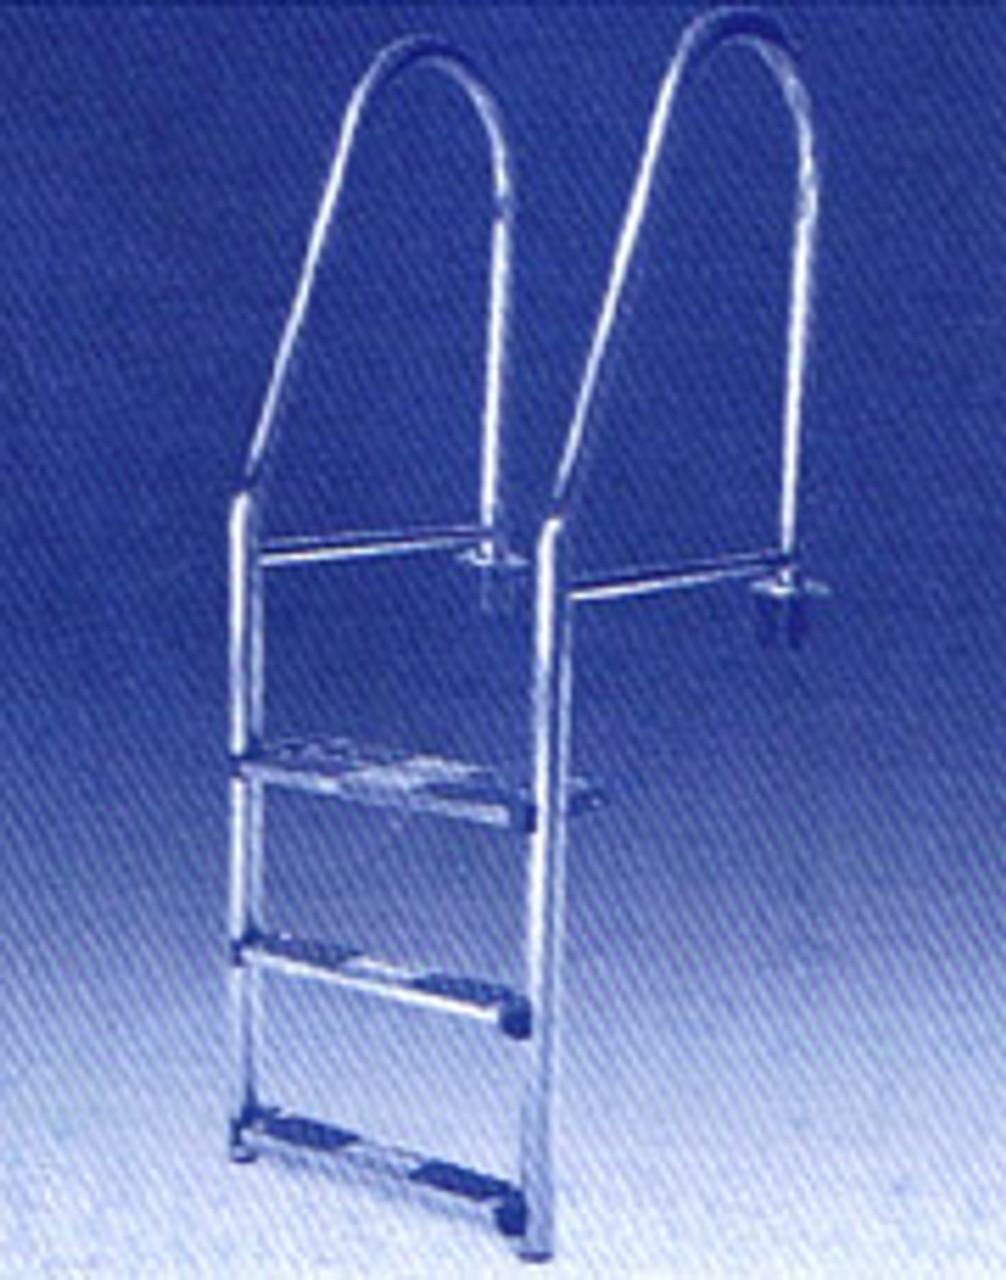 Astral Liner Swimming Pool Ladder